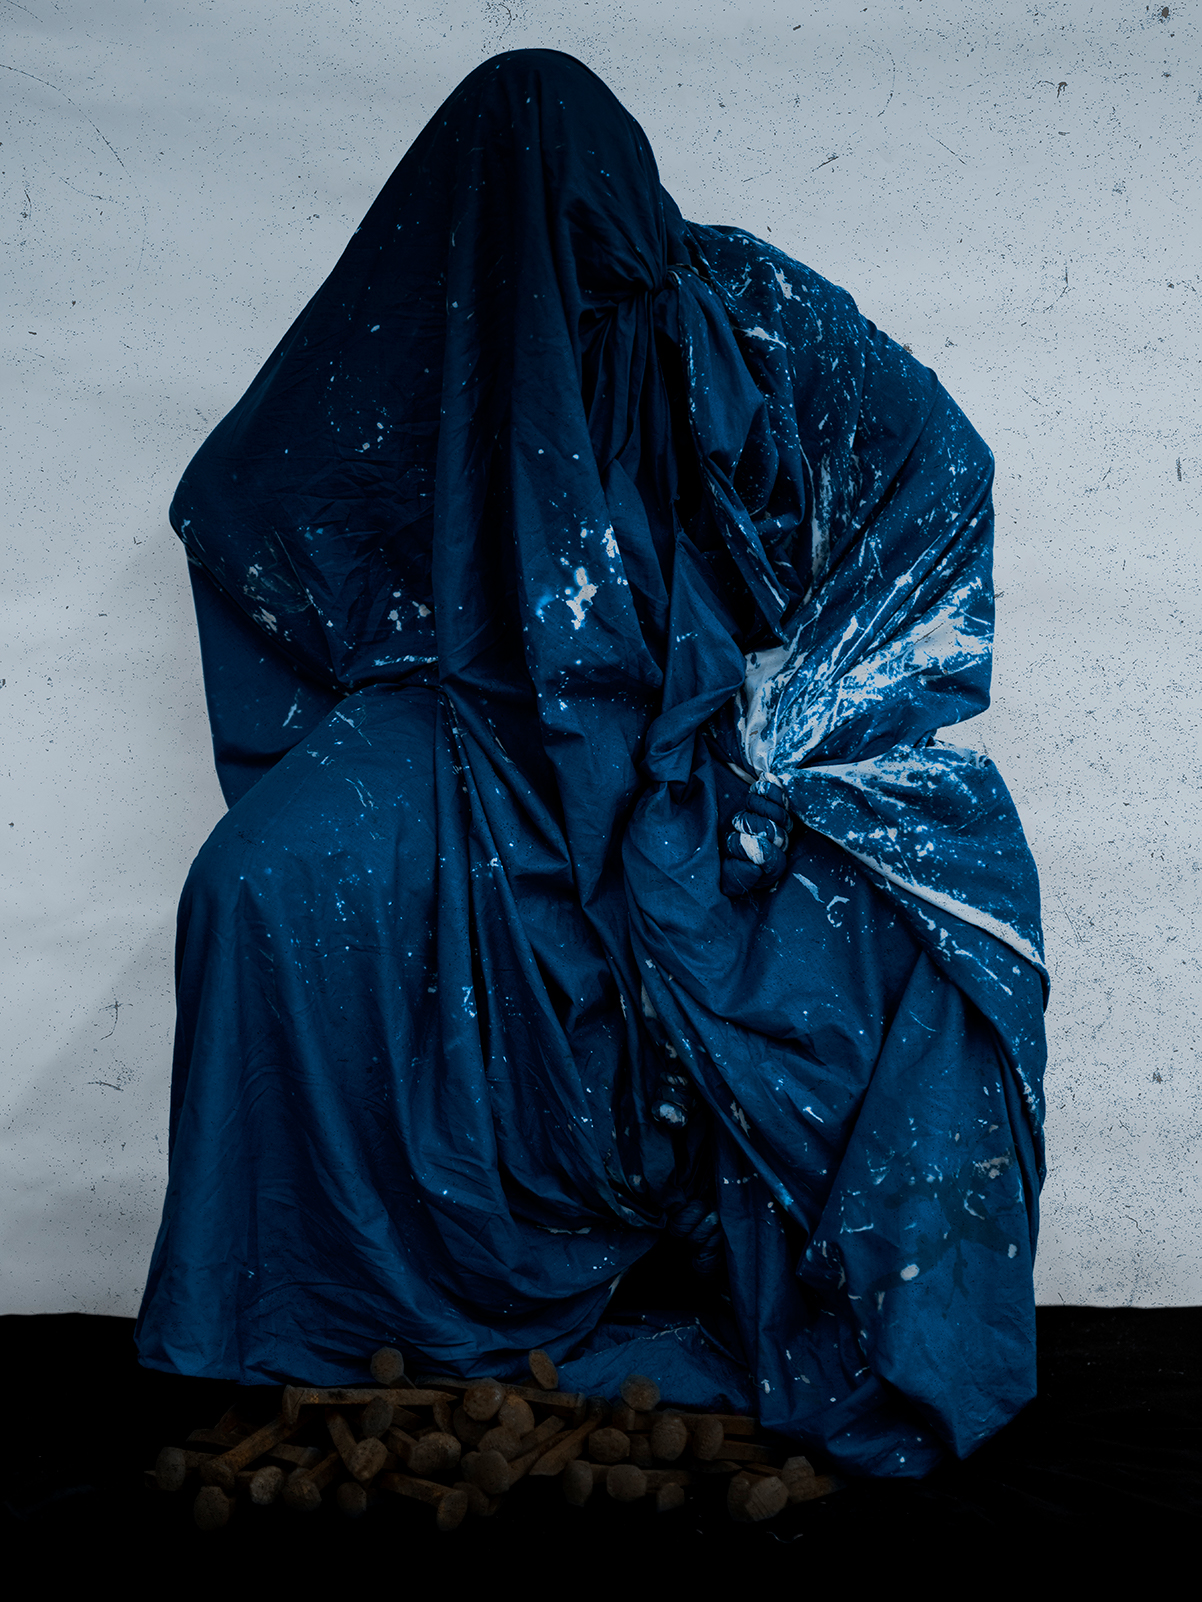 Shawn Theodore